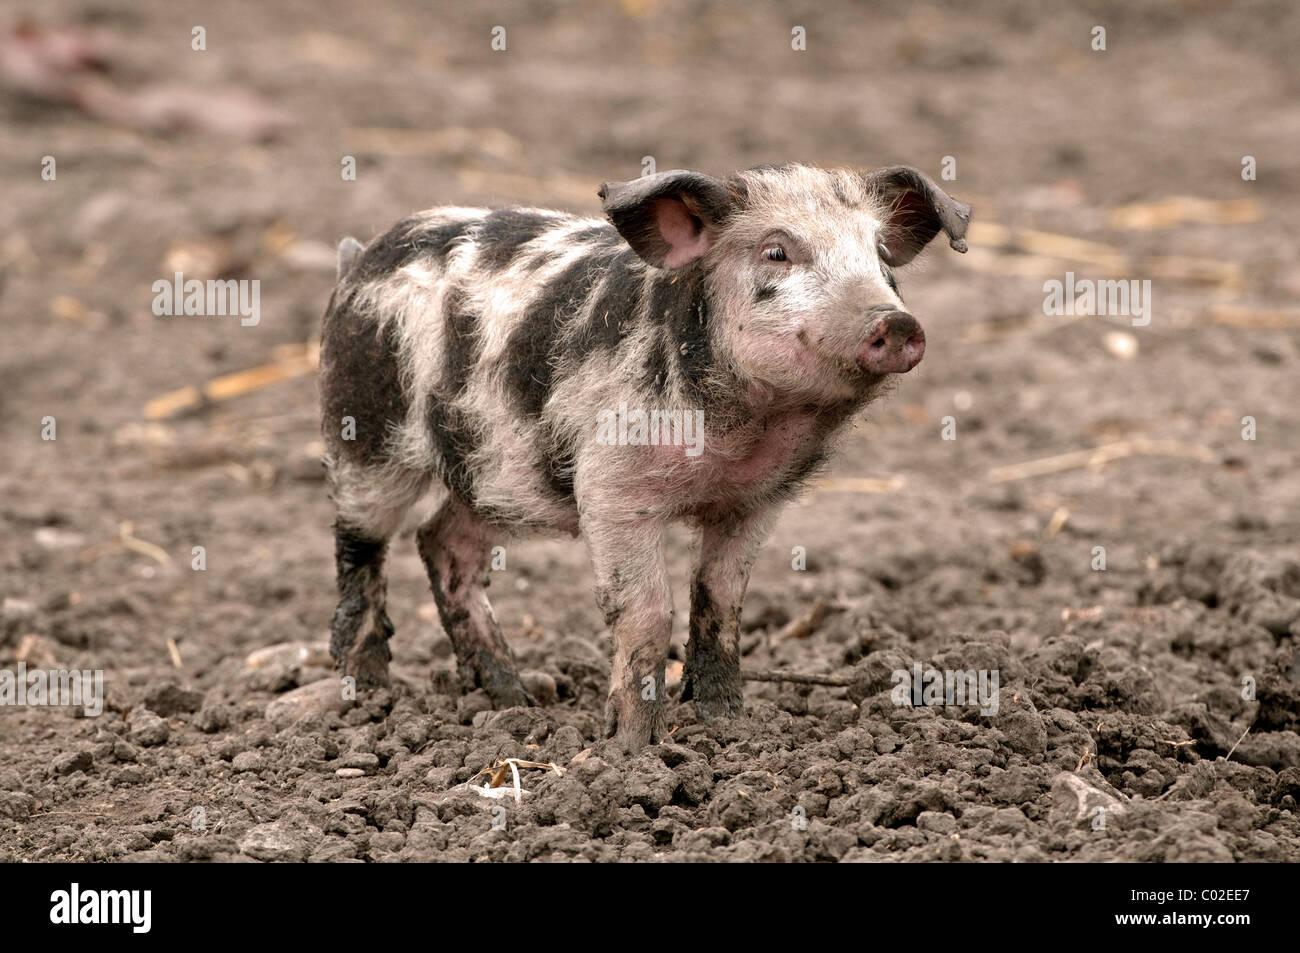 Domestic Pig, Turopolje pig (Sus scrofa domestica), piglet. Rare breed from Croatia. - Stock Image